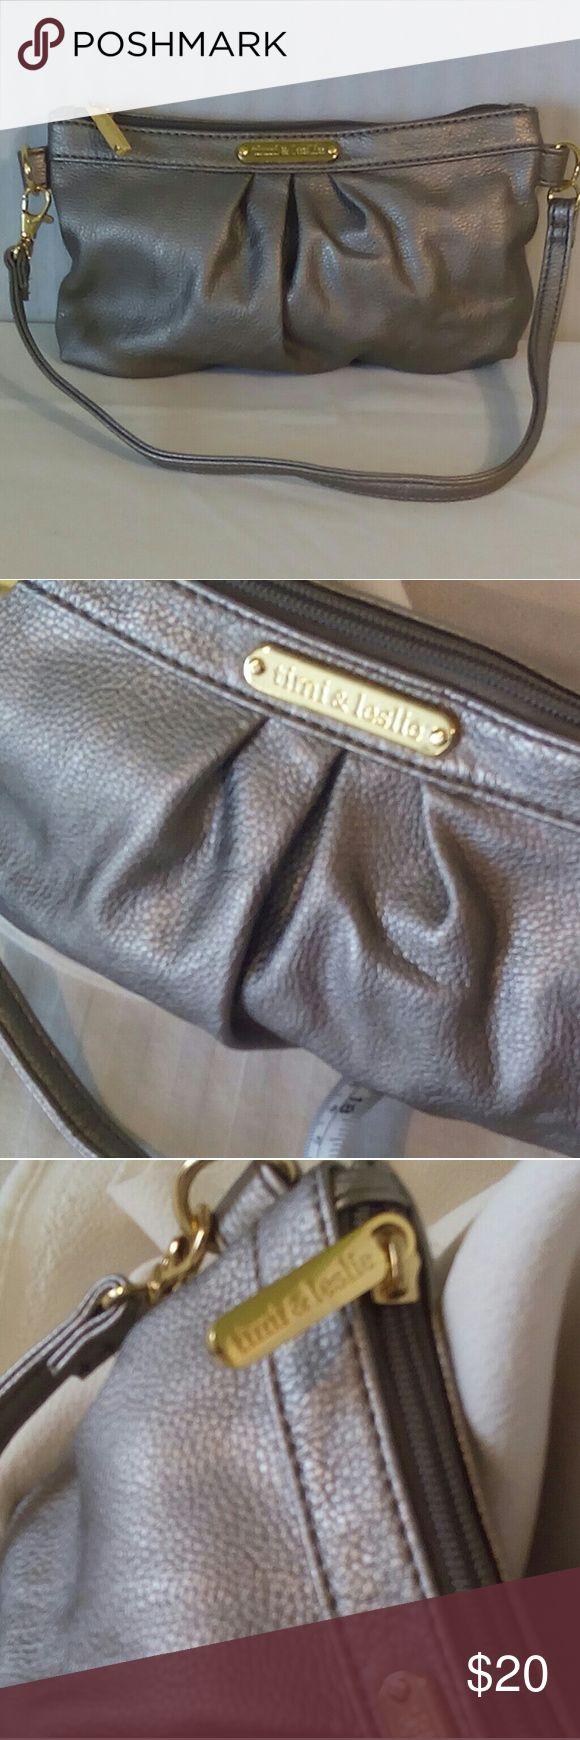 "Timi & Leslie Beige Metalic Handbag Timi & Leslie Beige Metalic Handbag.  Excellent bag.  No stains, rips or holes. 10""L, 5.5""W, 0.5""D, strap drop 4"". Timi & Leslie Bags Shoulder Bags"